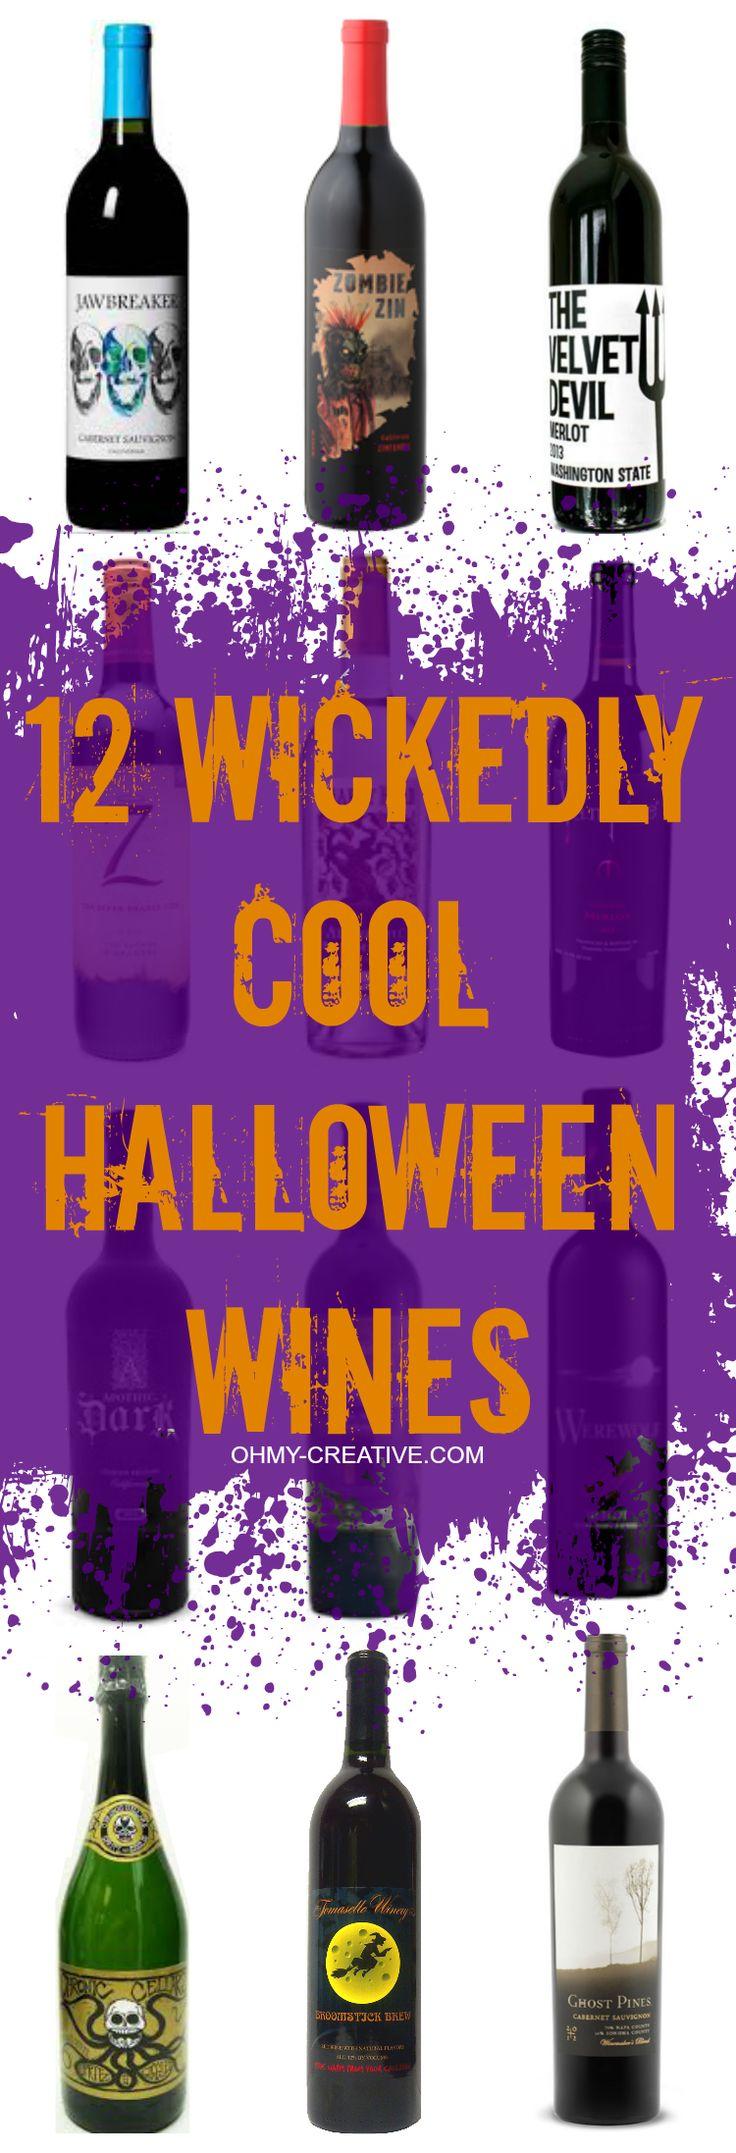 489 best images about Halloween on Pinterest   Frankenstein, Easy ...